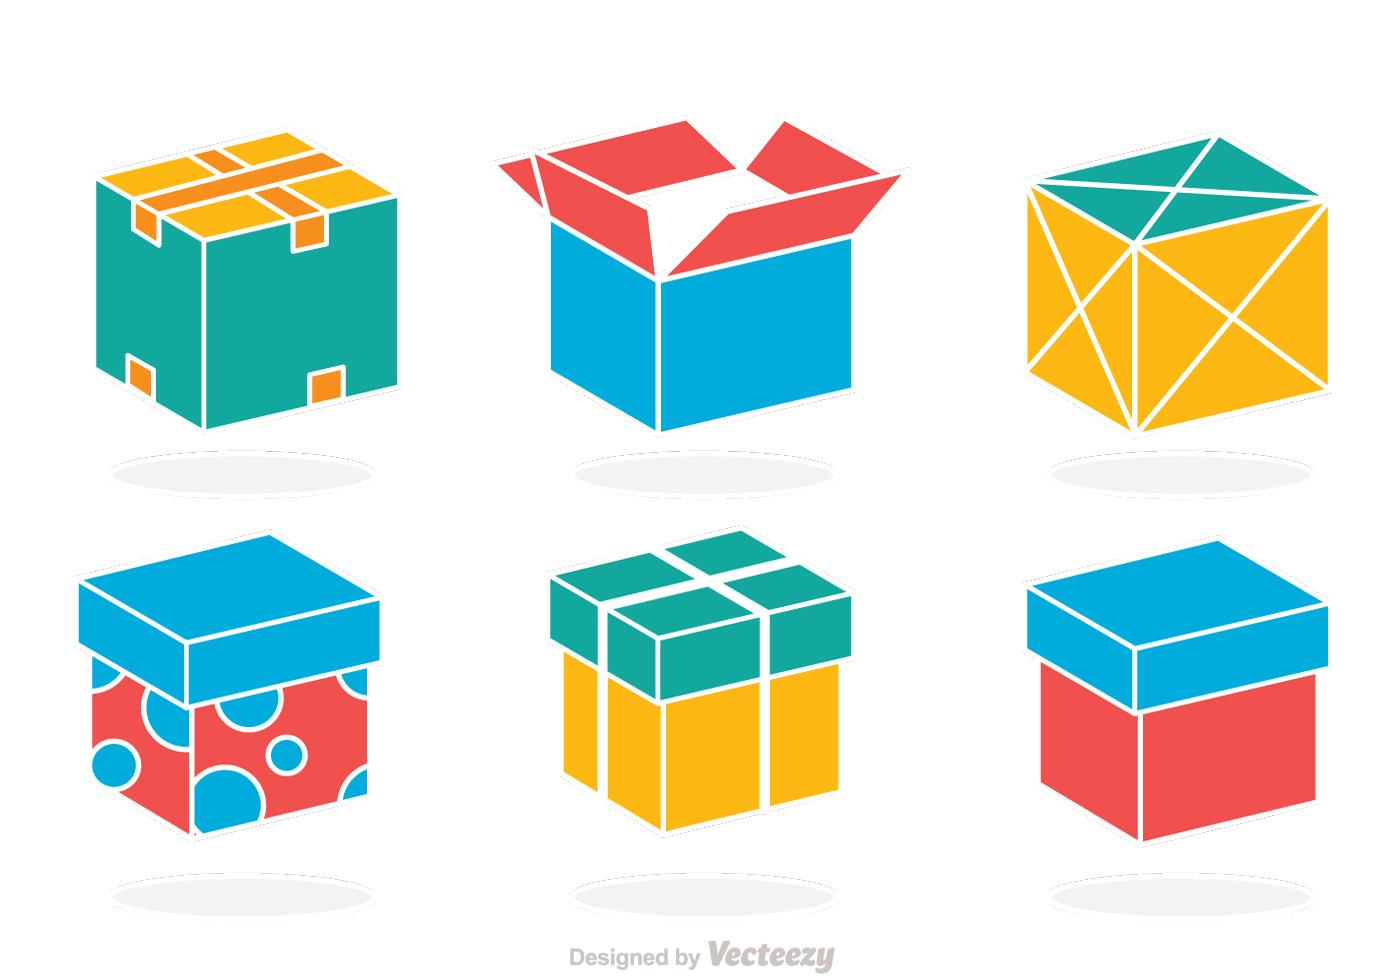 colorful box vector download free vector art stock graphics images rh vecteezy com box vector cranks box vector cranks instructions